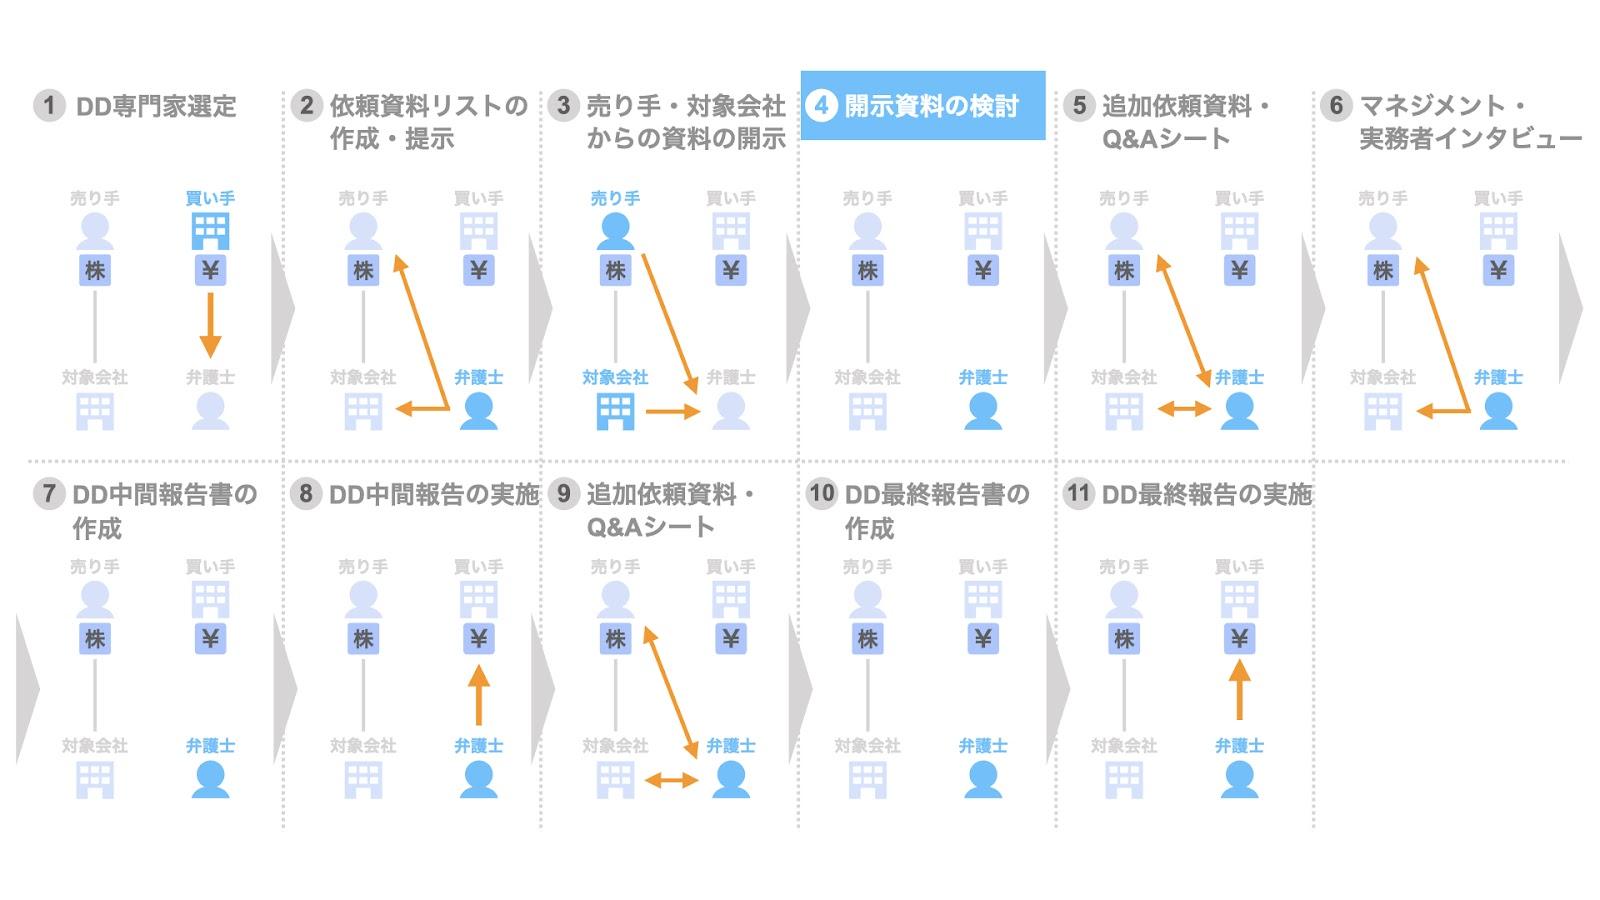 4. 開示資料の検討